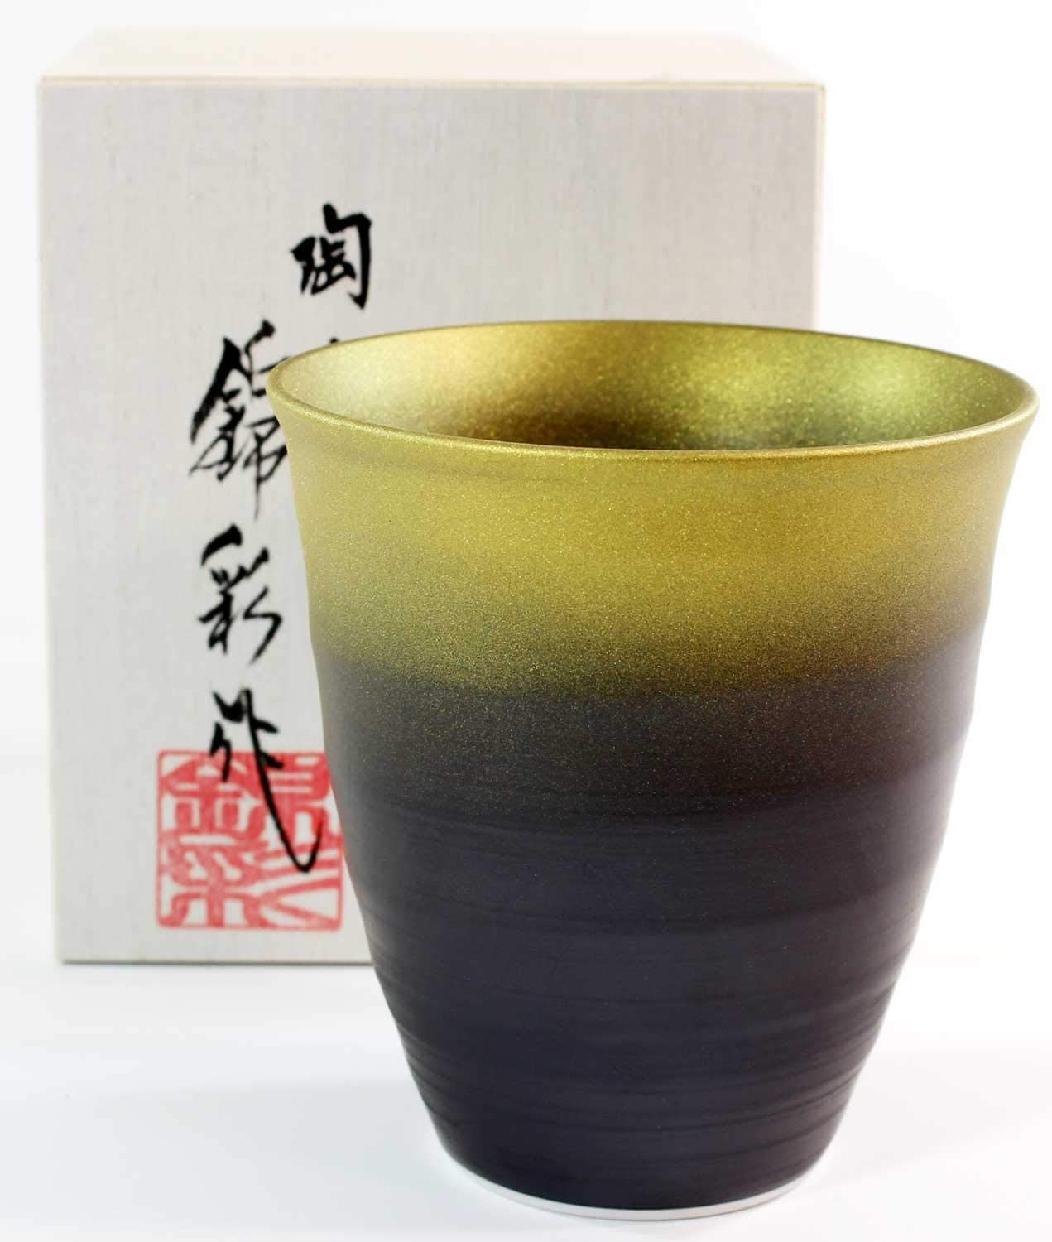 藤井錦彩窯 窯変金彩焼酎カップの商品画像